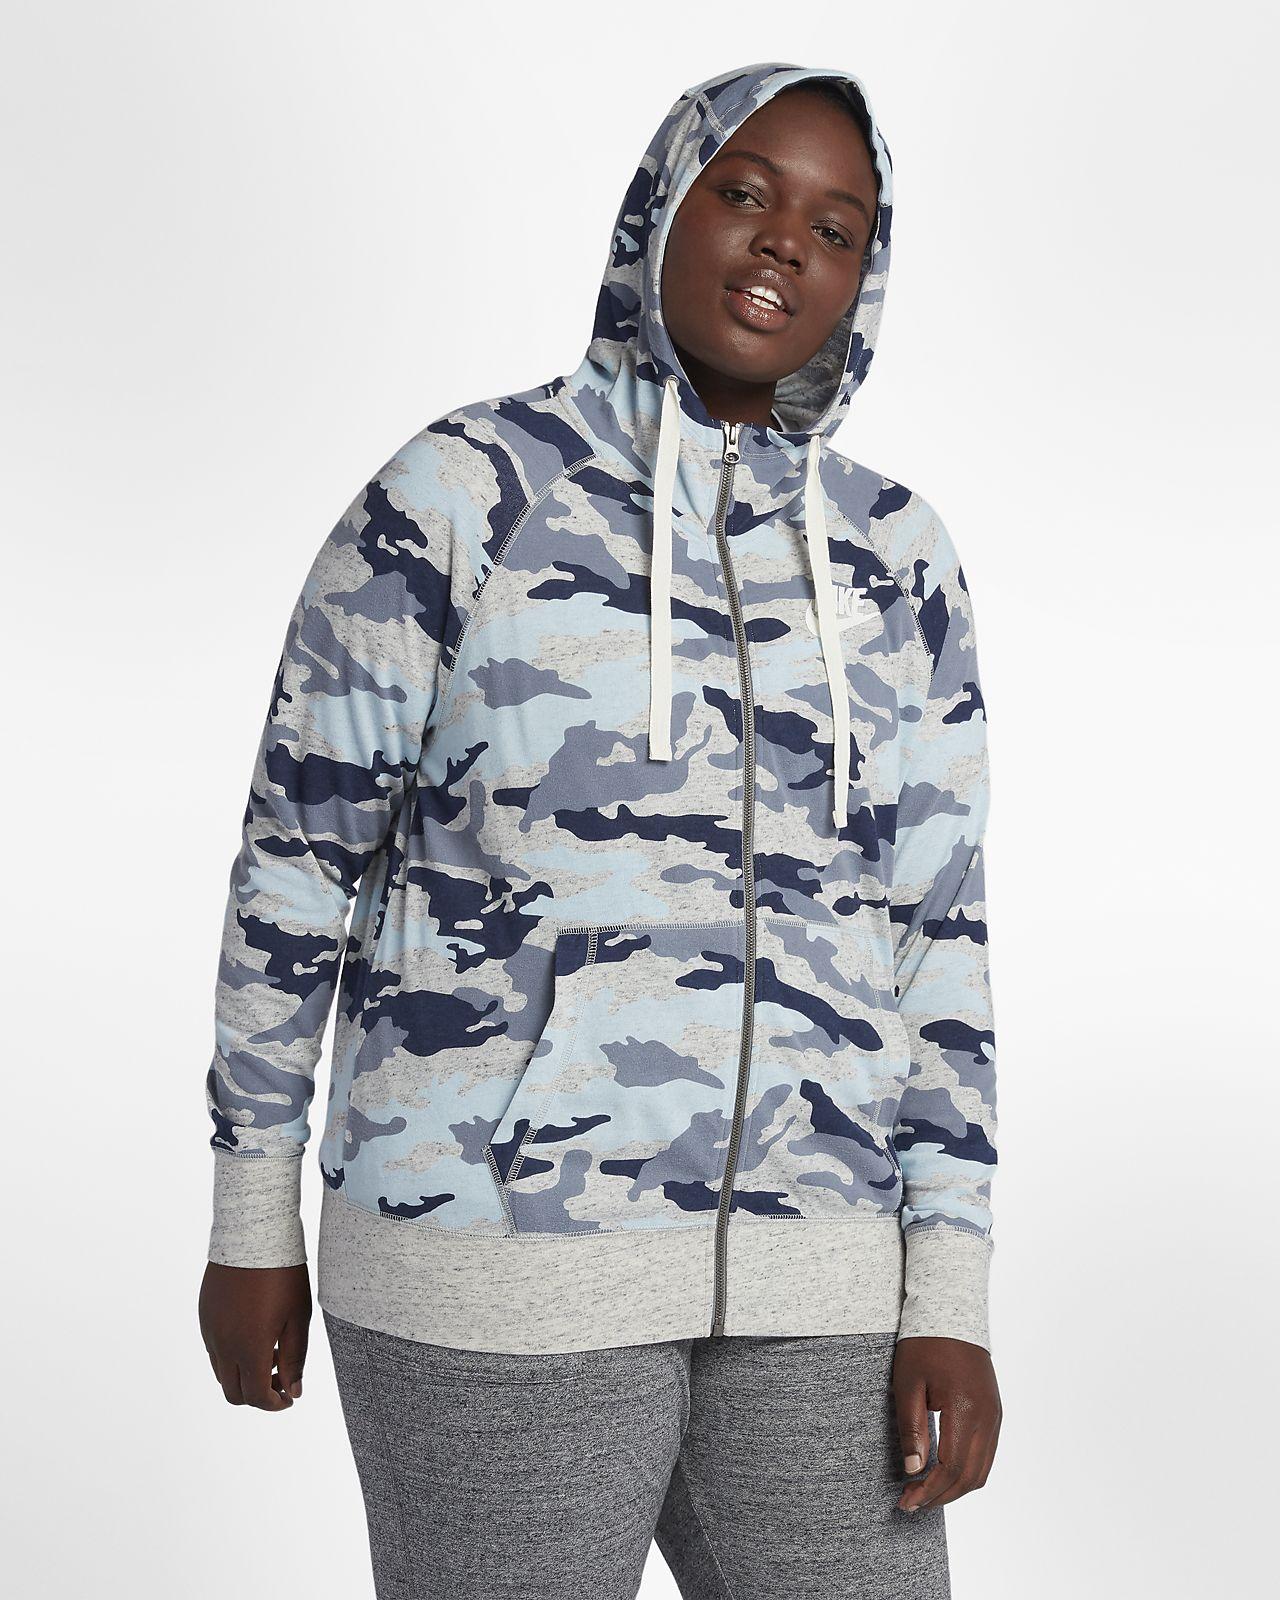 Sweat à capuche camouflage Nike Sportswear Gym Vintage pour Femme (grande  taille) 13be0d6f80e8